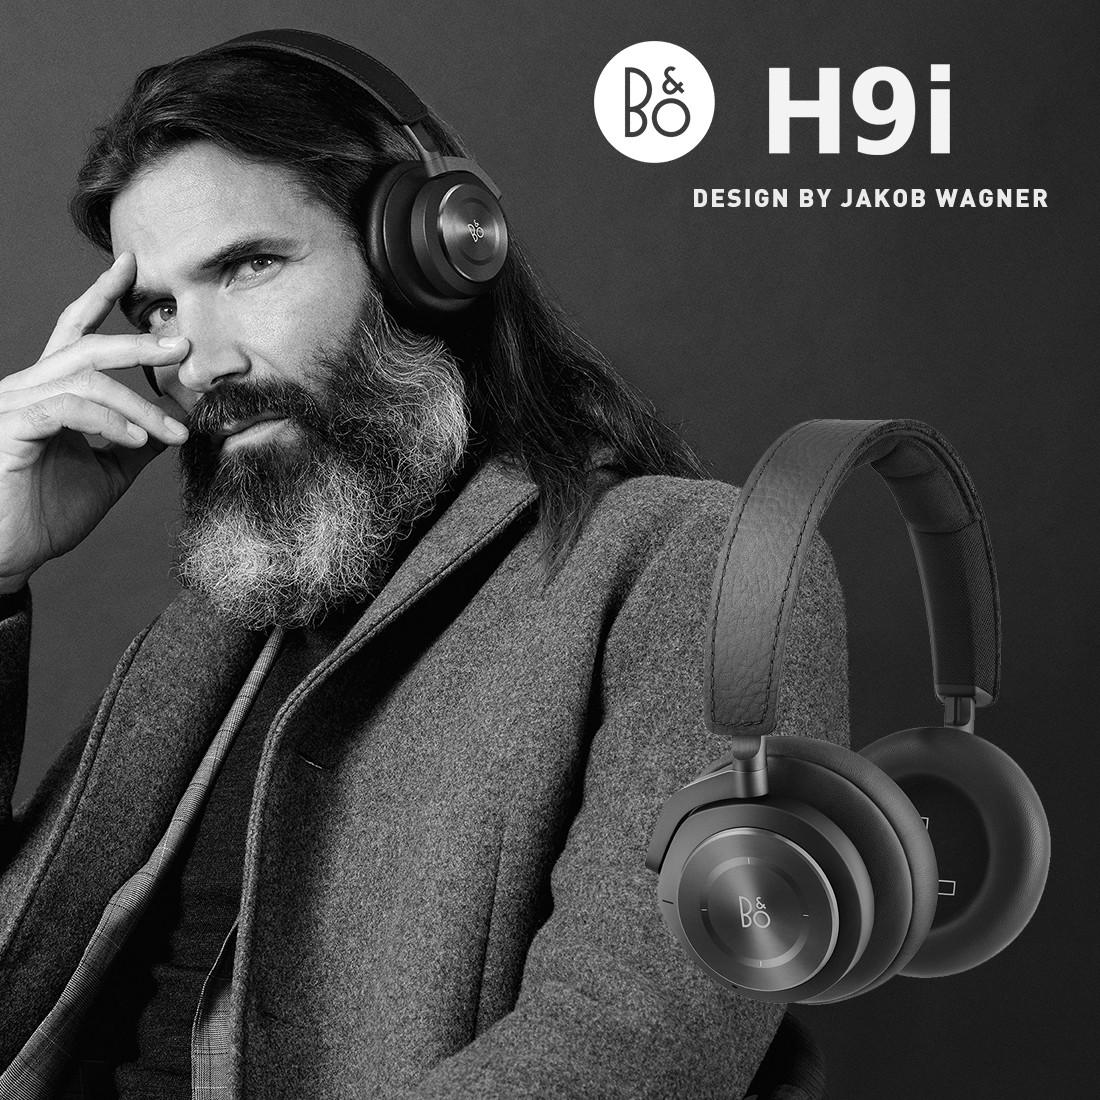 ●●【B&O オリジナルプレゼント付き】【B&O Play】Beoplay H9i ヘッドホンワイヤレス Bang & Olufsen ホームスピーカー BANG & OLUFSEN Bluetooth 4.2 ブルートゥース 密閉型 高音質【コンビニ受取対応商品】